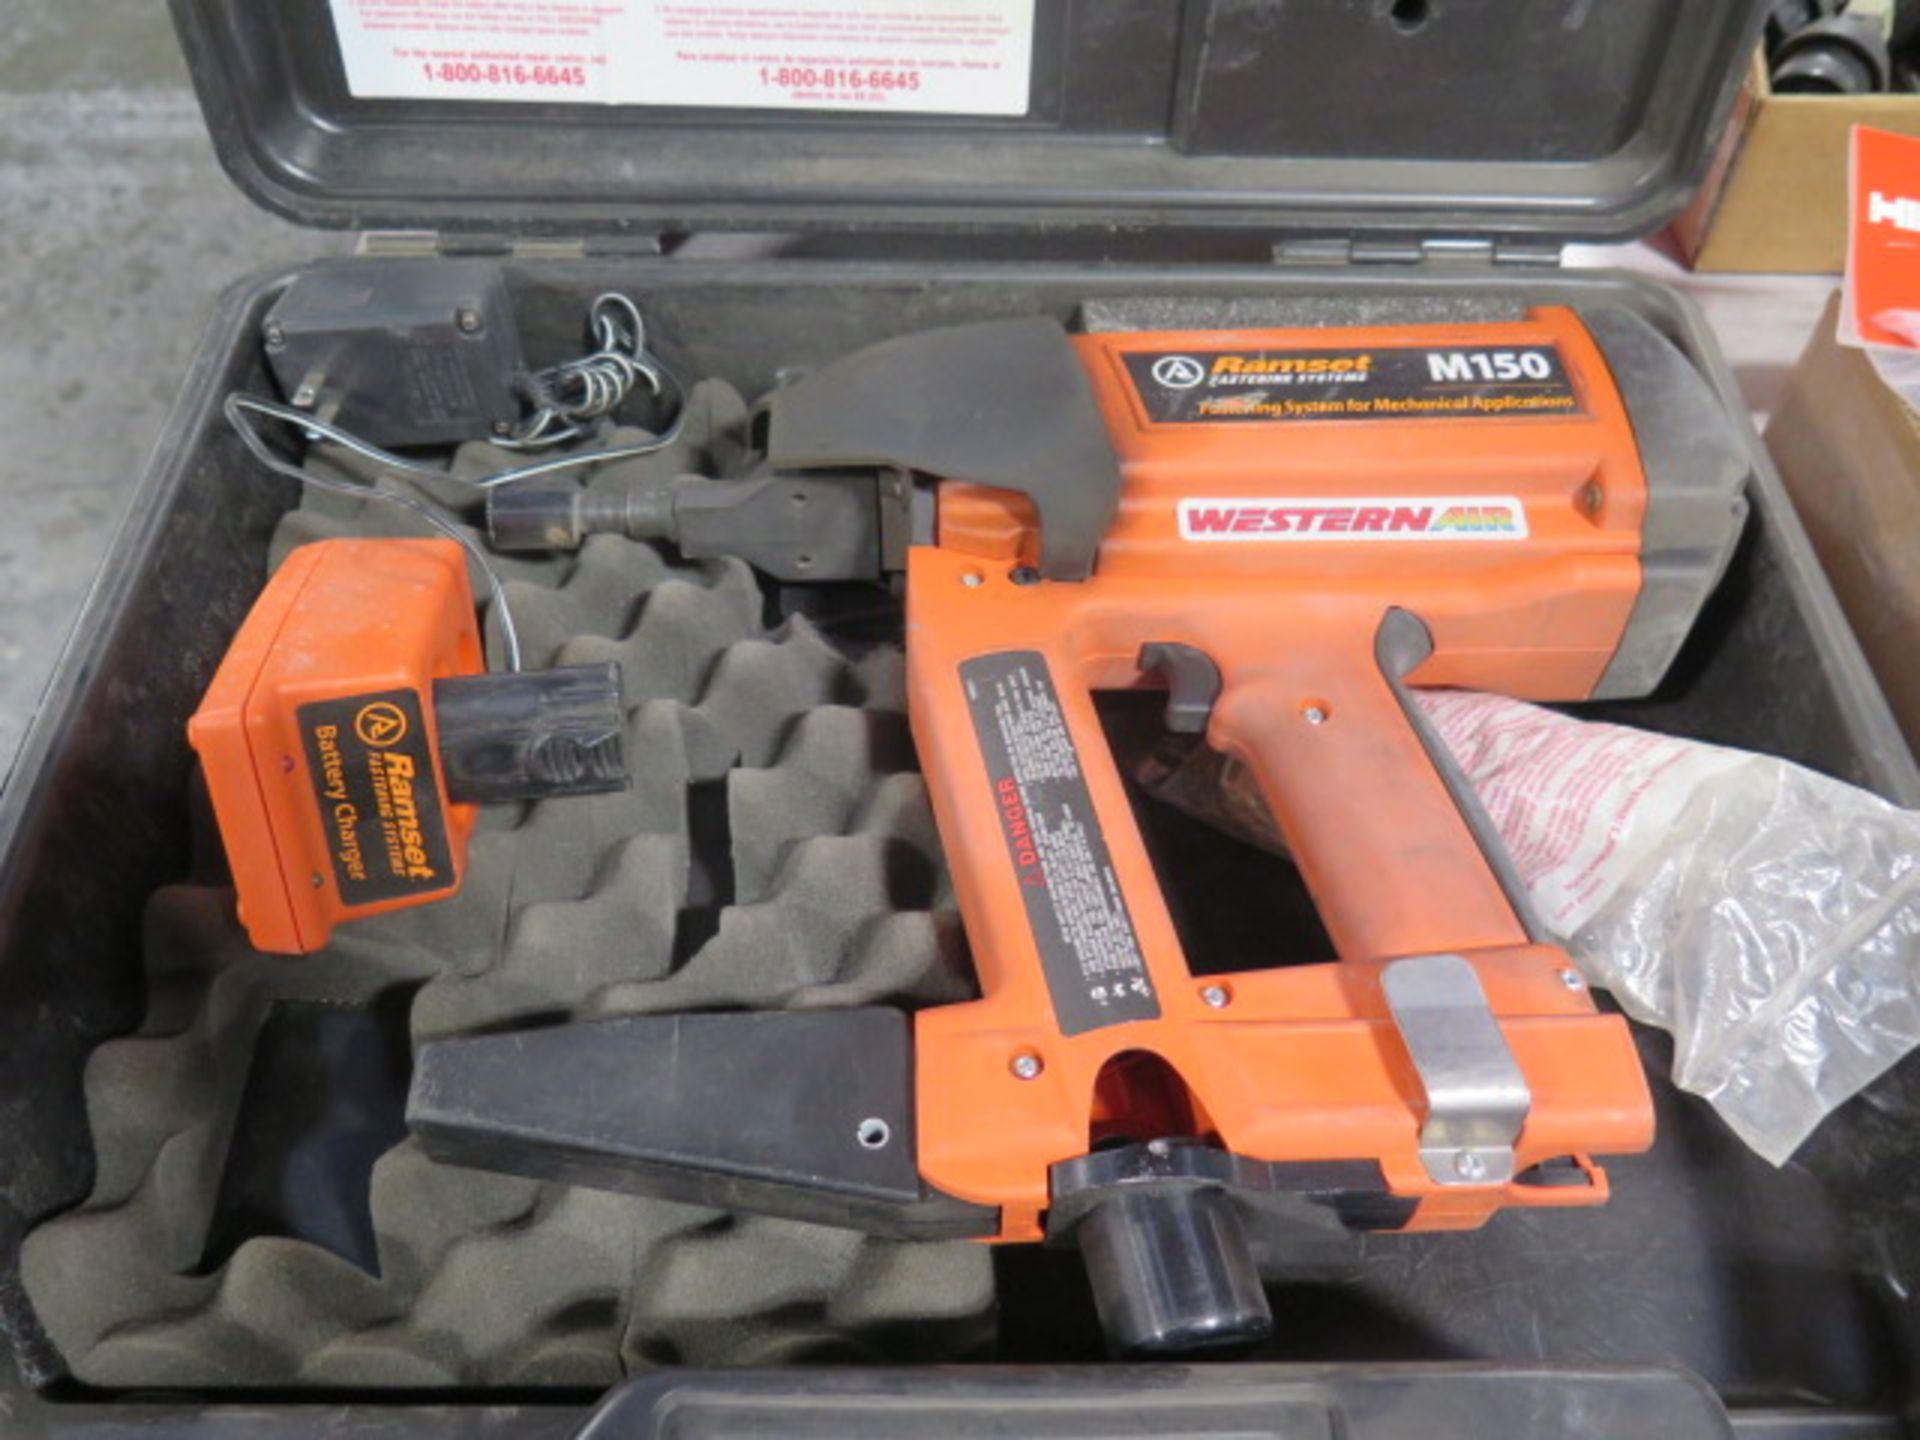 Ramset mdl. M150 Gss Powered Piston Type Fastening Gun w/ Magazine Feed (SOLD AS-IS - NO WARRANTY)